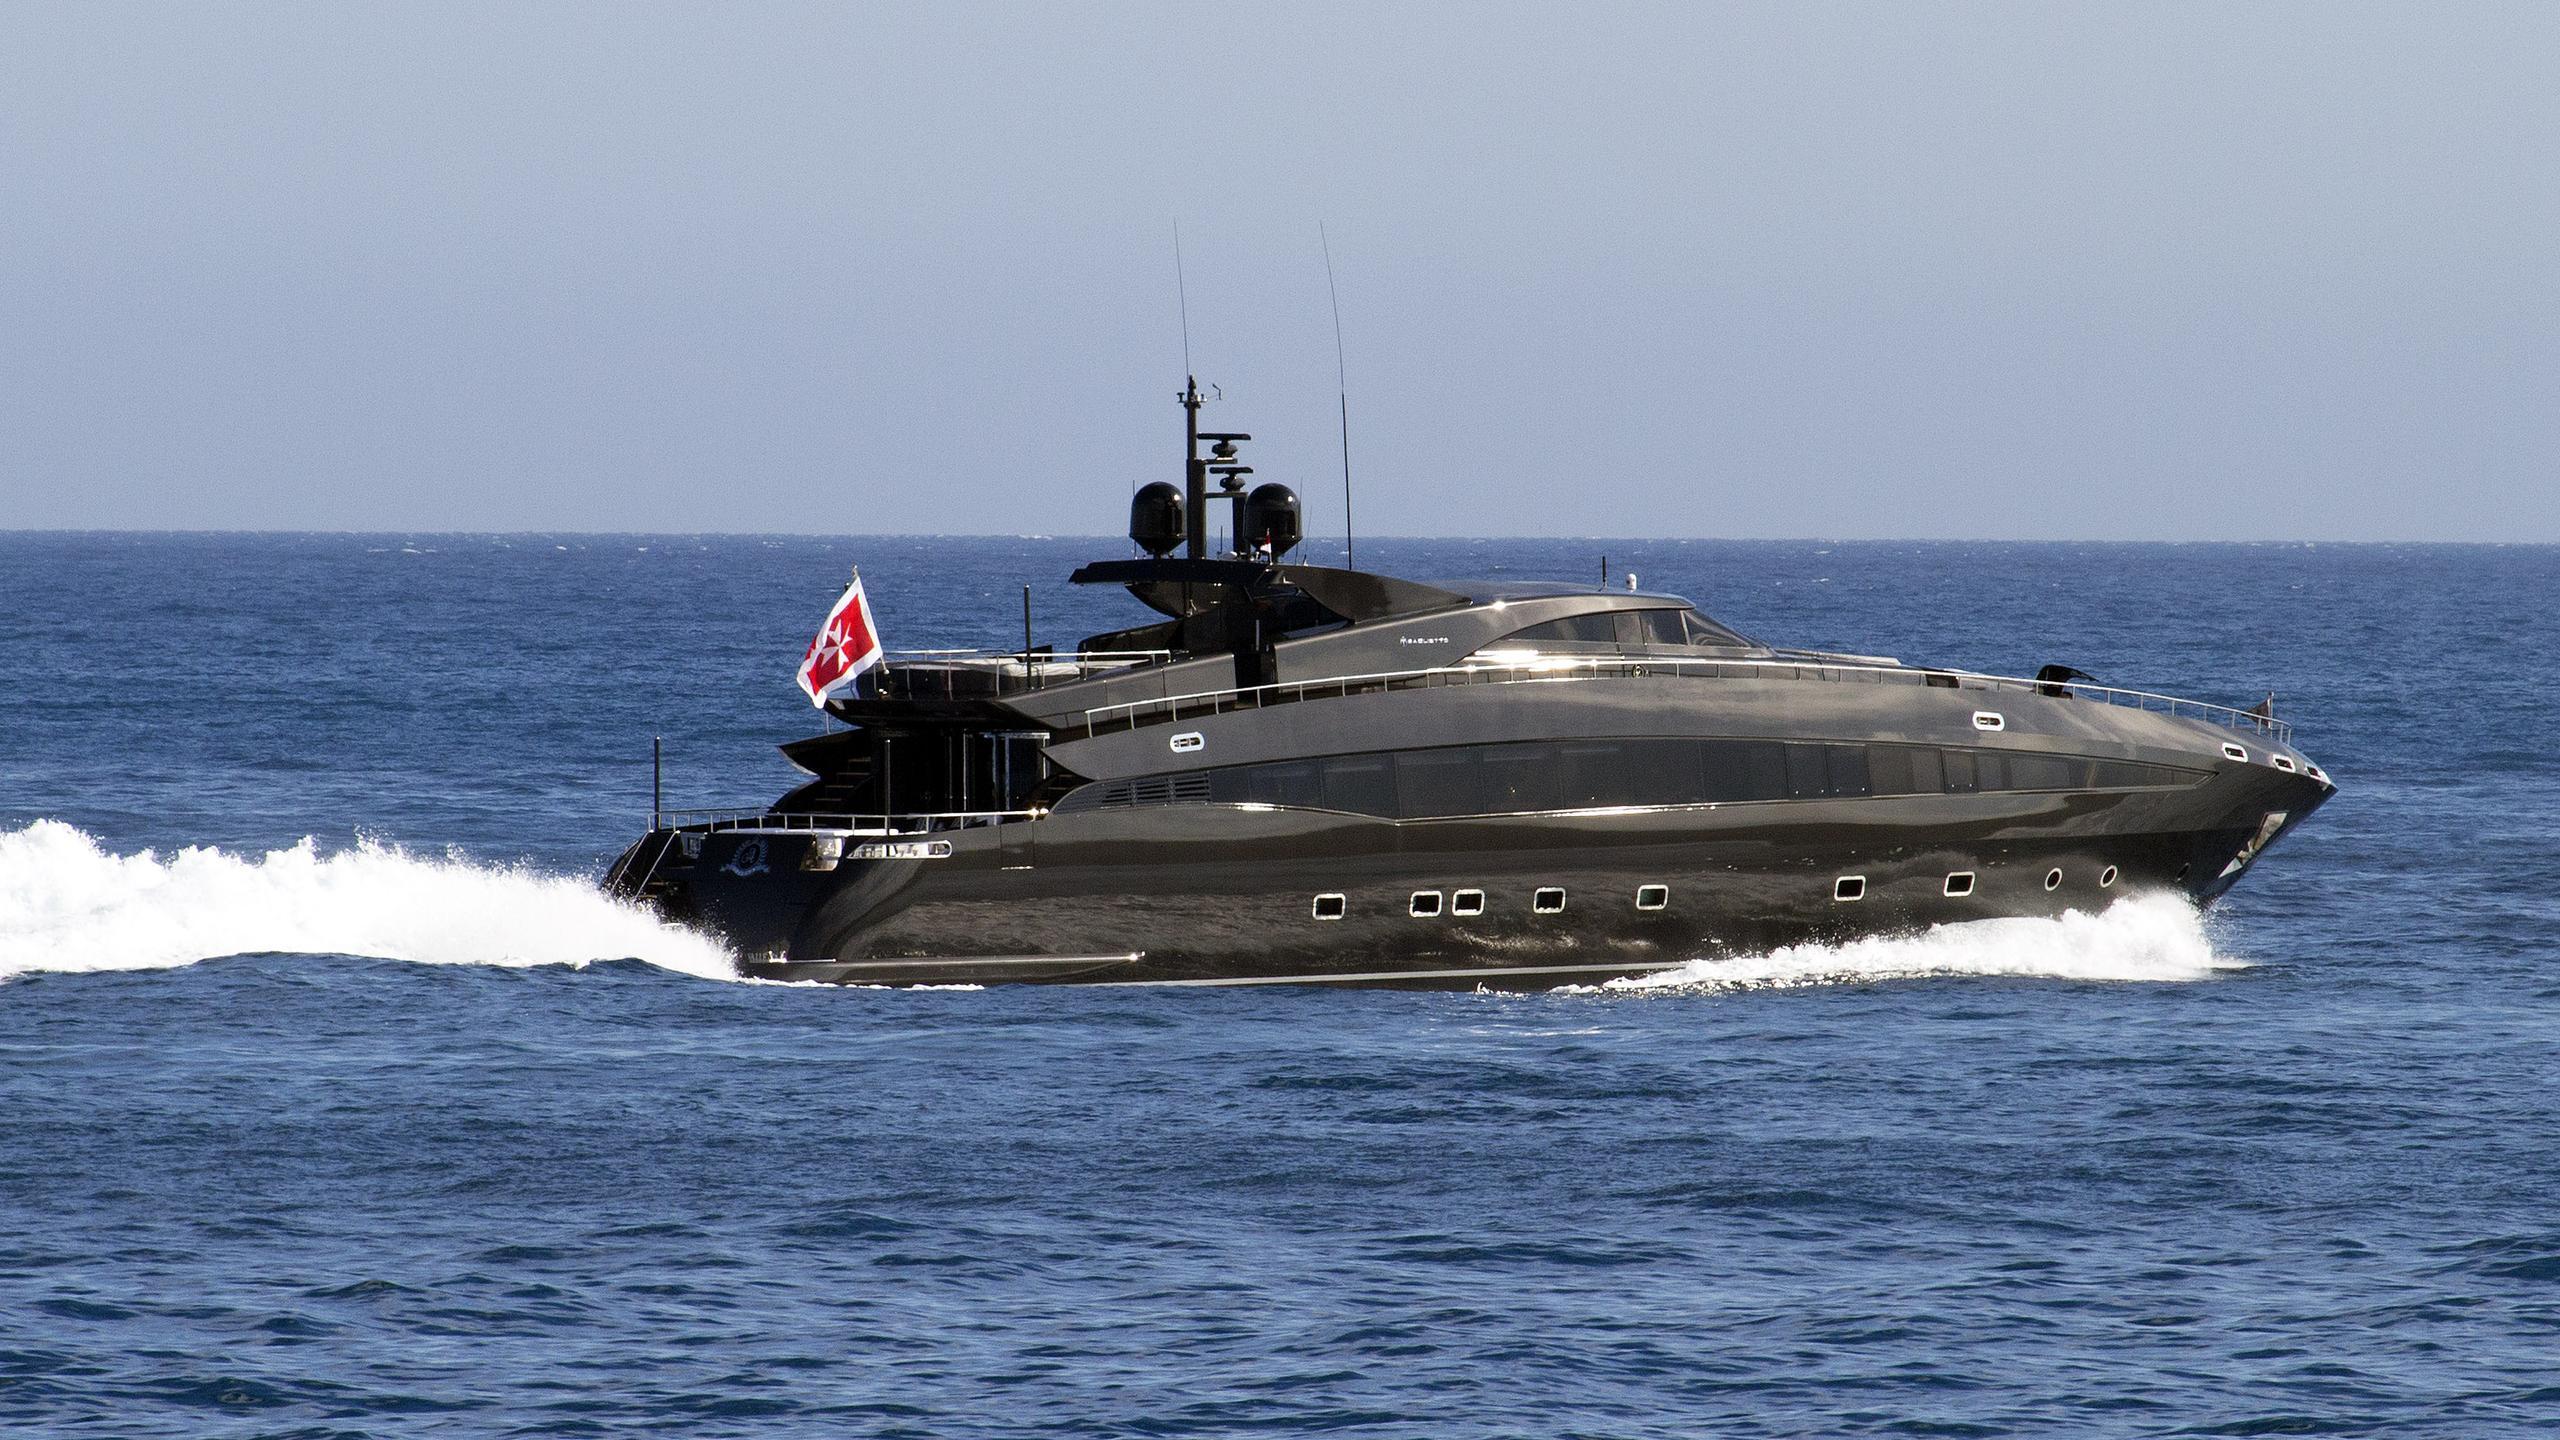 ability-motor-yacht-baglietto-2004-41m-cruising-half-stern